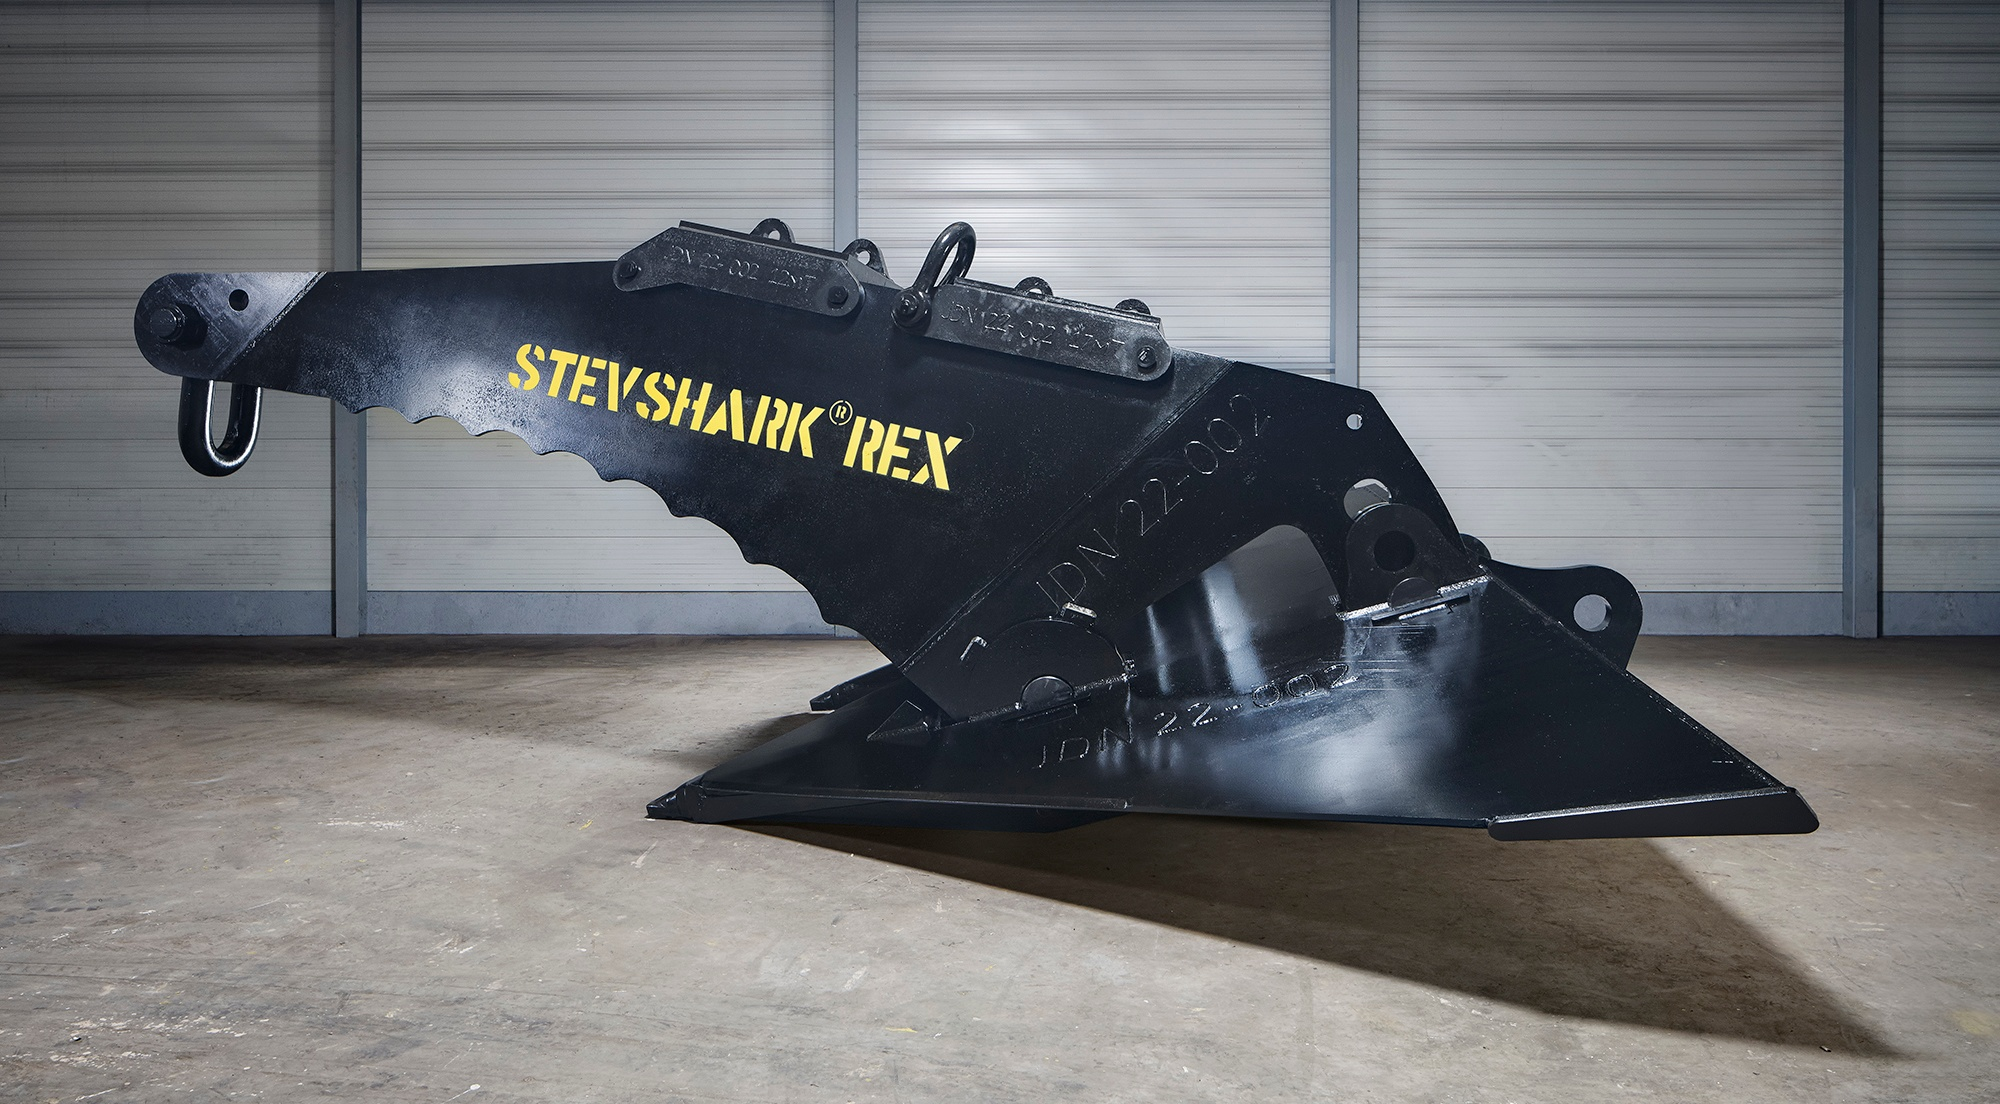 Vryhof_Stevshark Rex_Jan De Nul Group_cropped